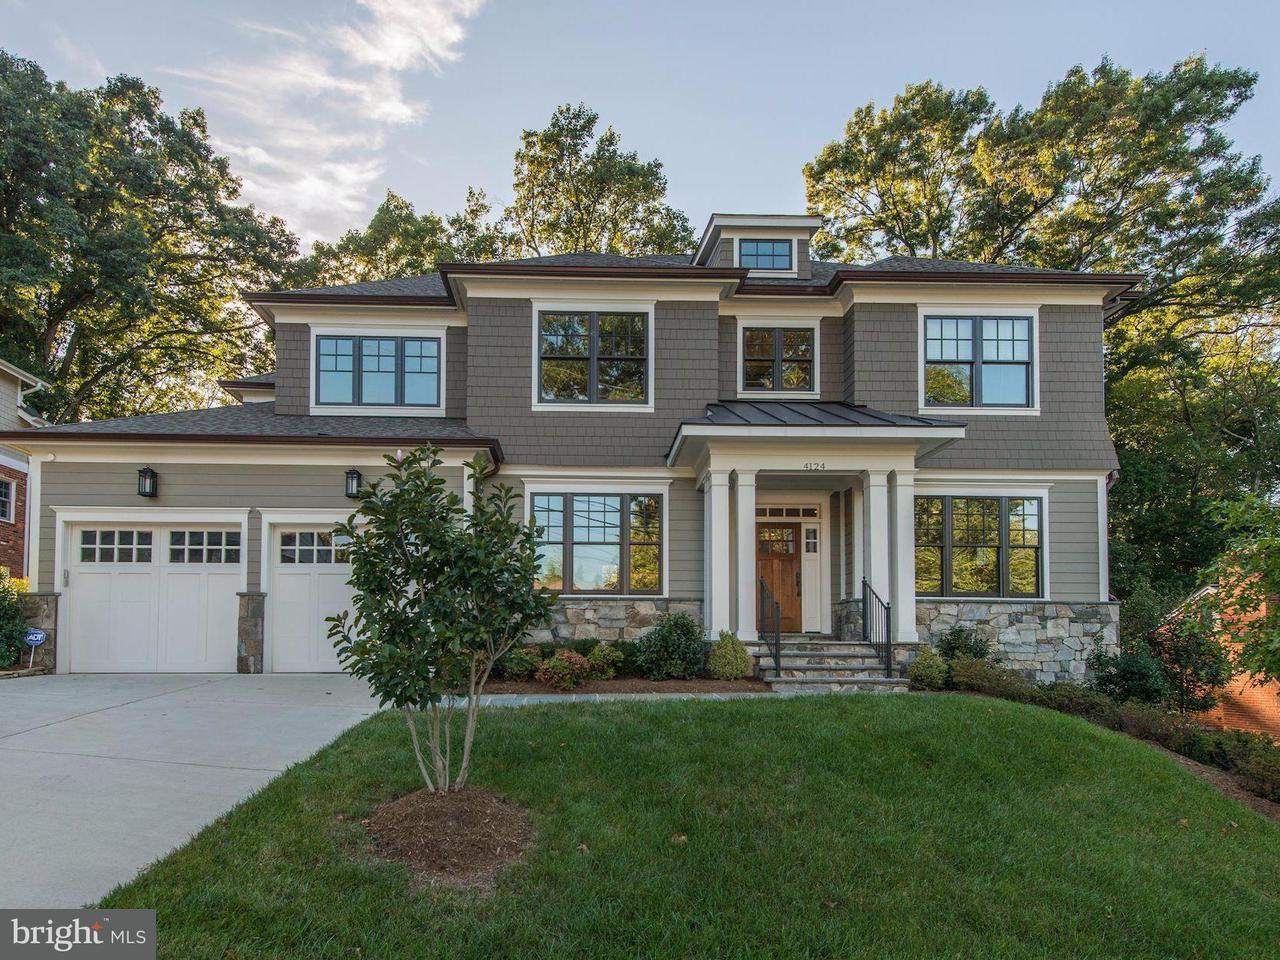 Single Family Home for Sale at 4124 Richmond St N 4124 Richmond St N Arlington, Virginia 22207 United States